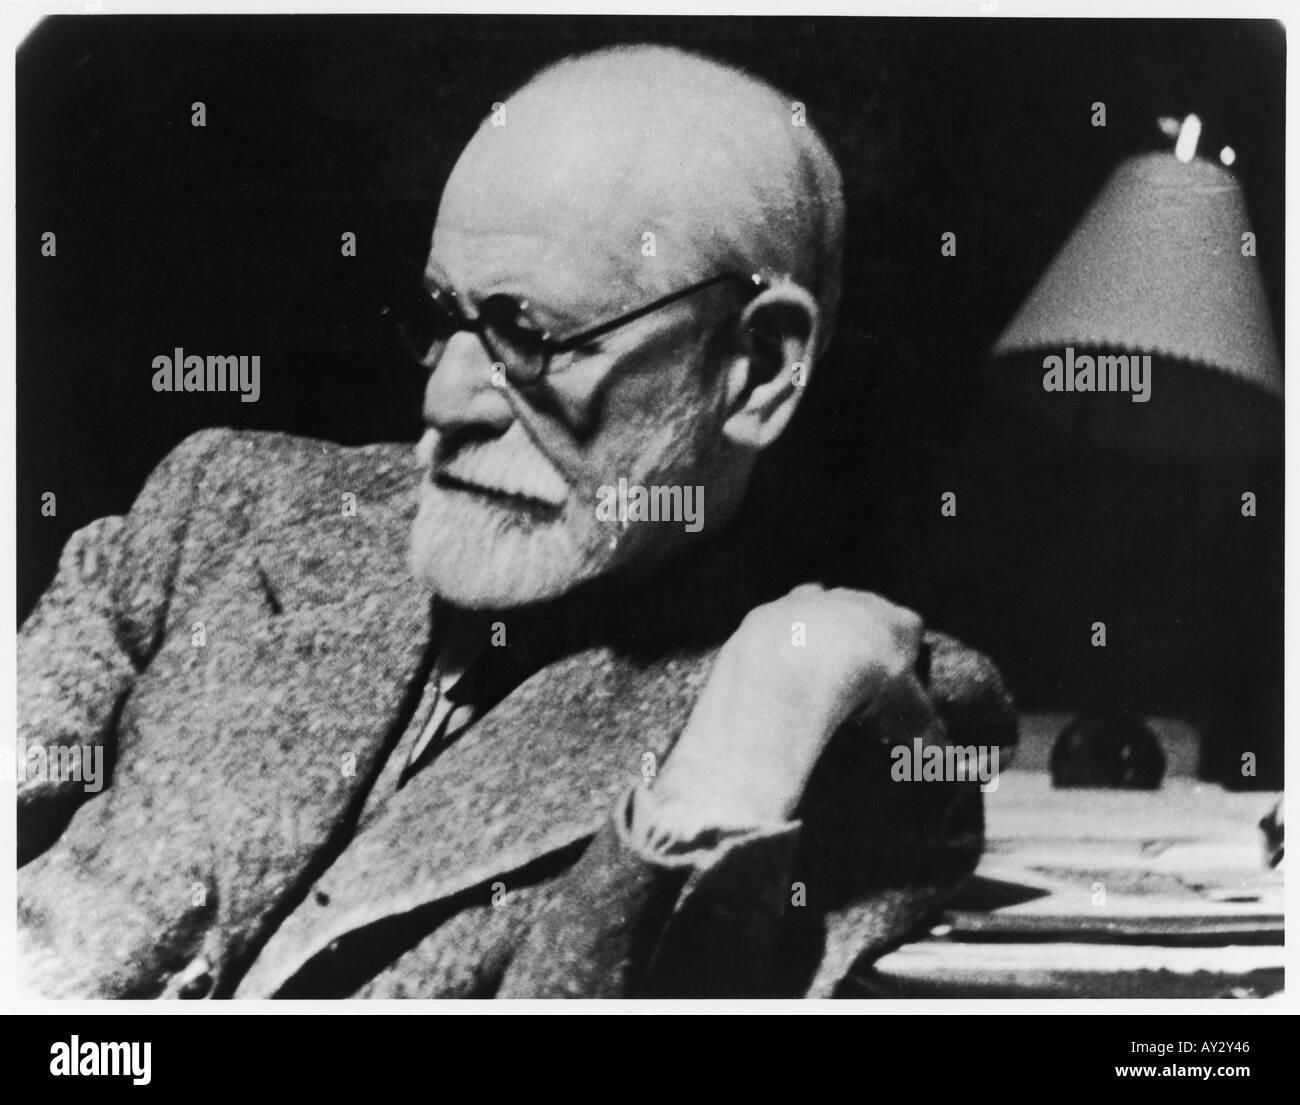 Sigmund Freud 1938 27a - Stock Image